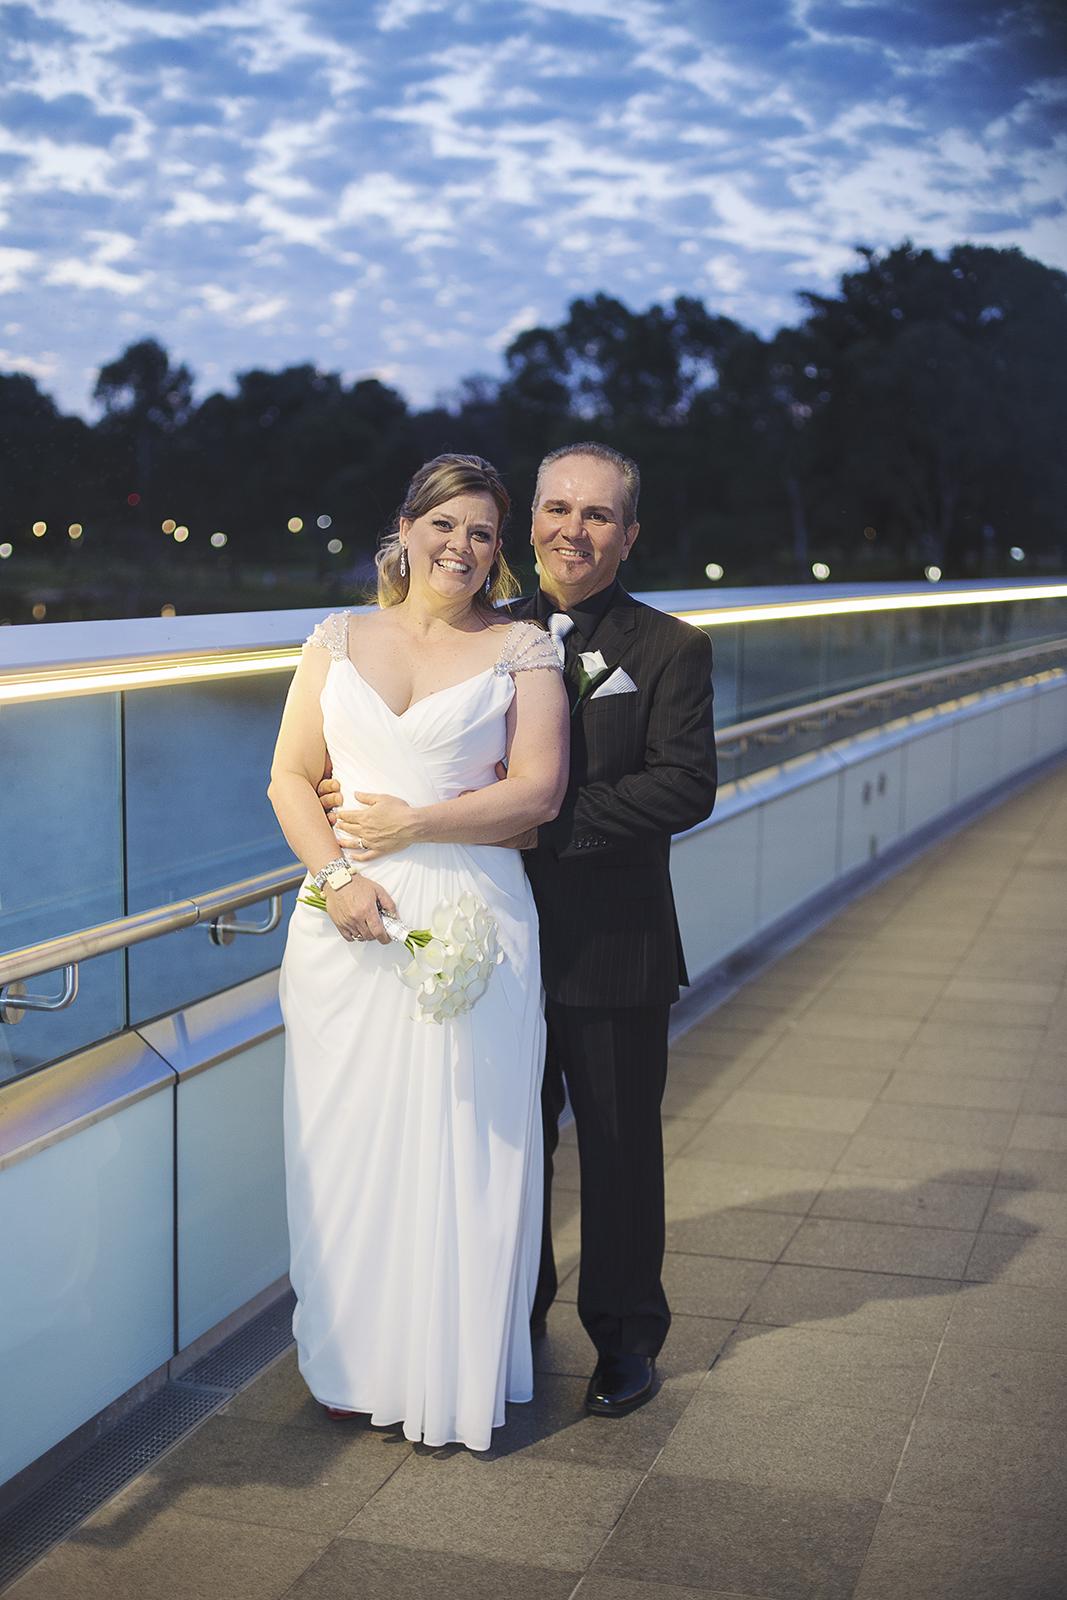 twilight wedding portrait on the river torrens.jpg